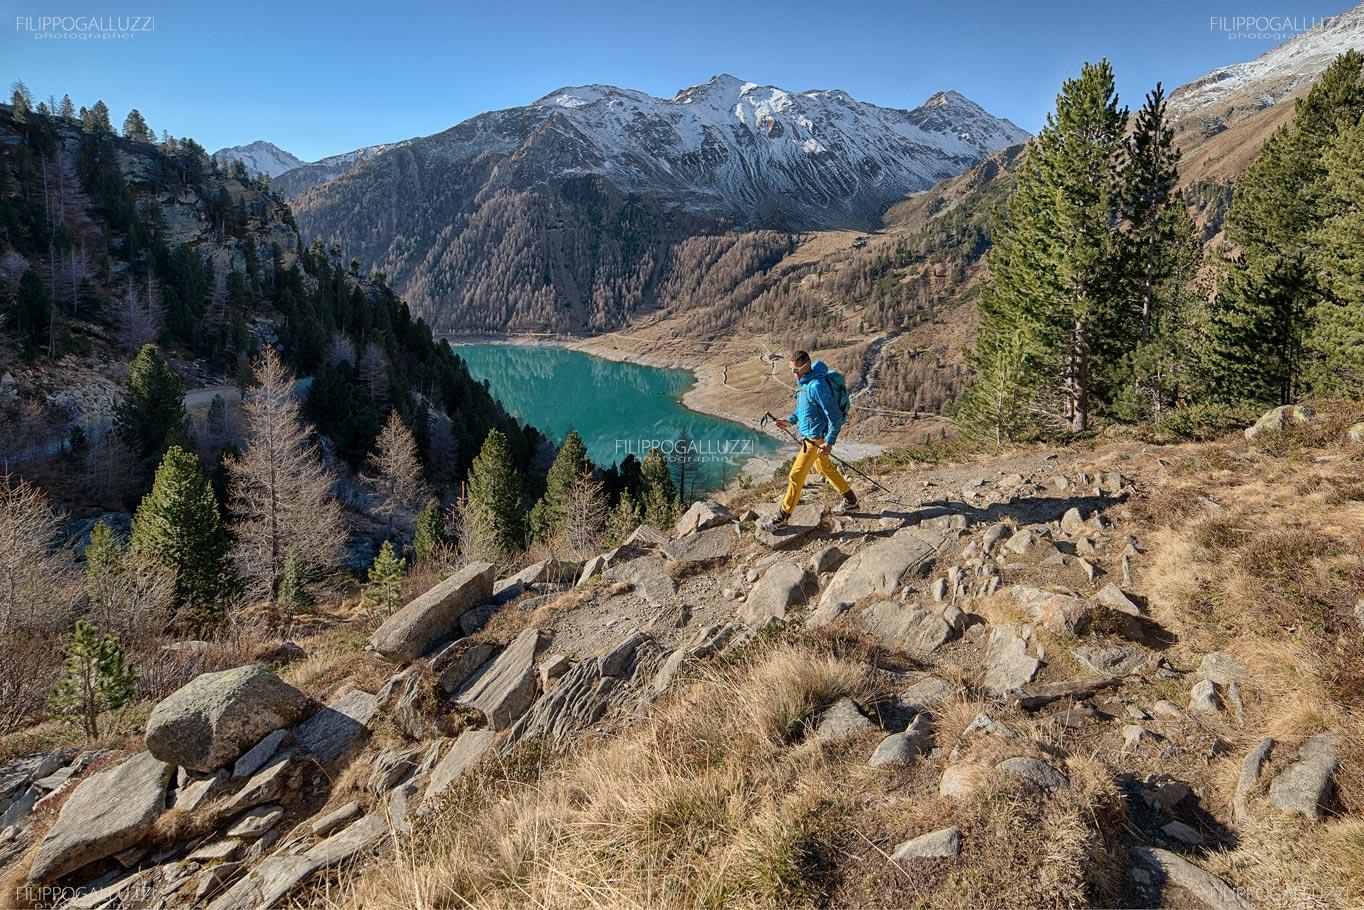 Trekking autunnale in valle Aurina, lago di Neves